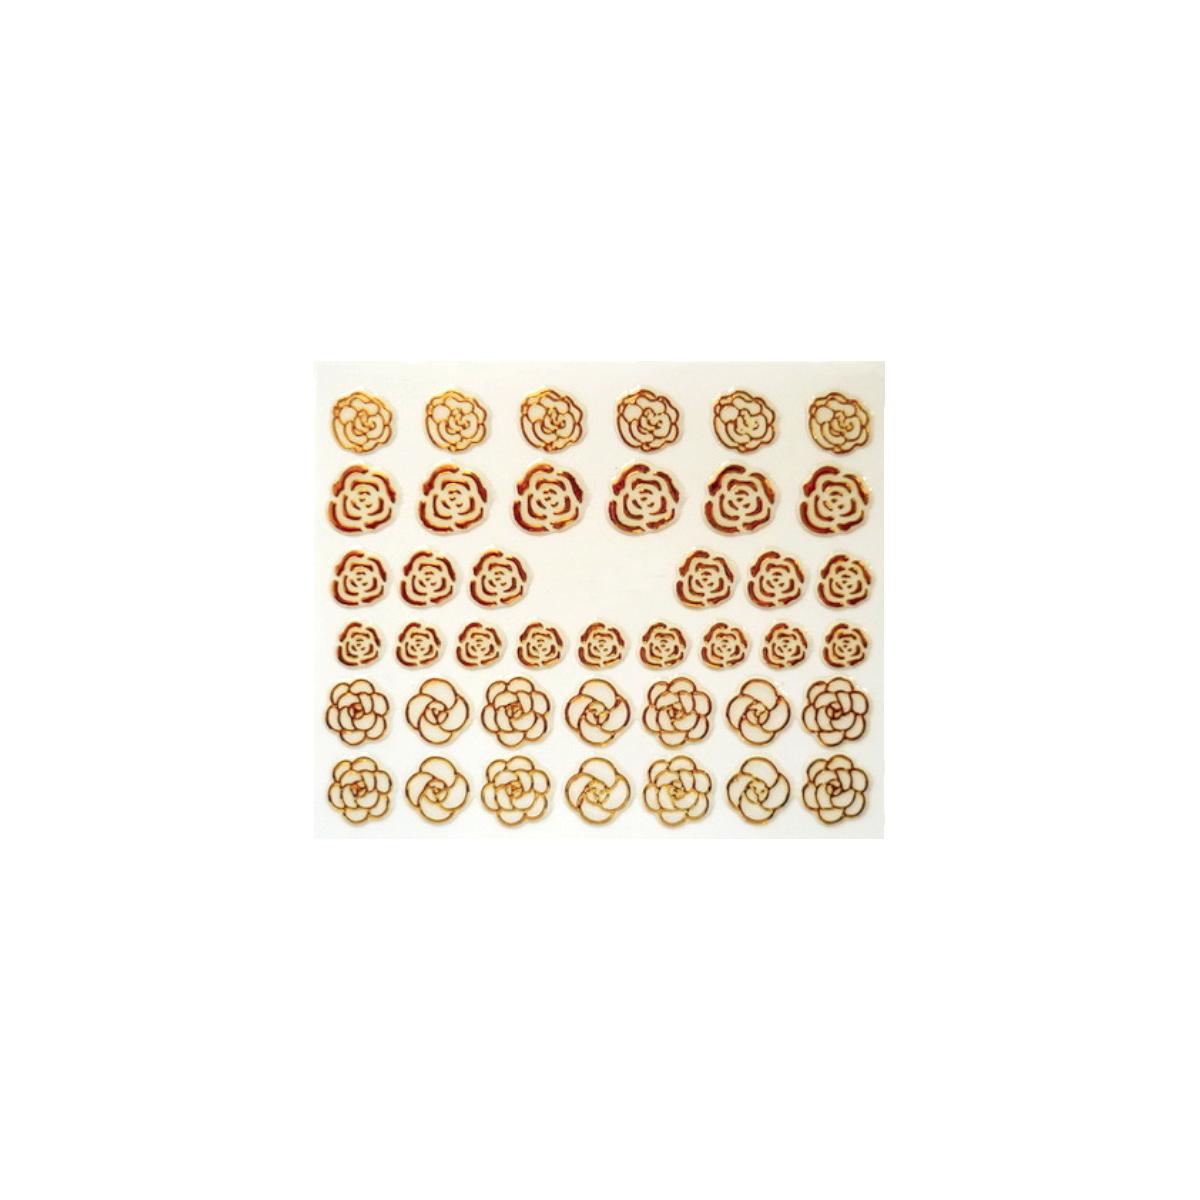 https://www.kit-manucure.com/2078-thickbox_default/stickers-roses-dorées.jpg